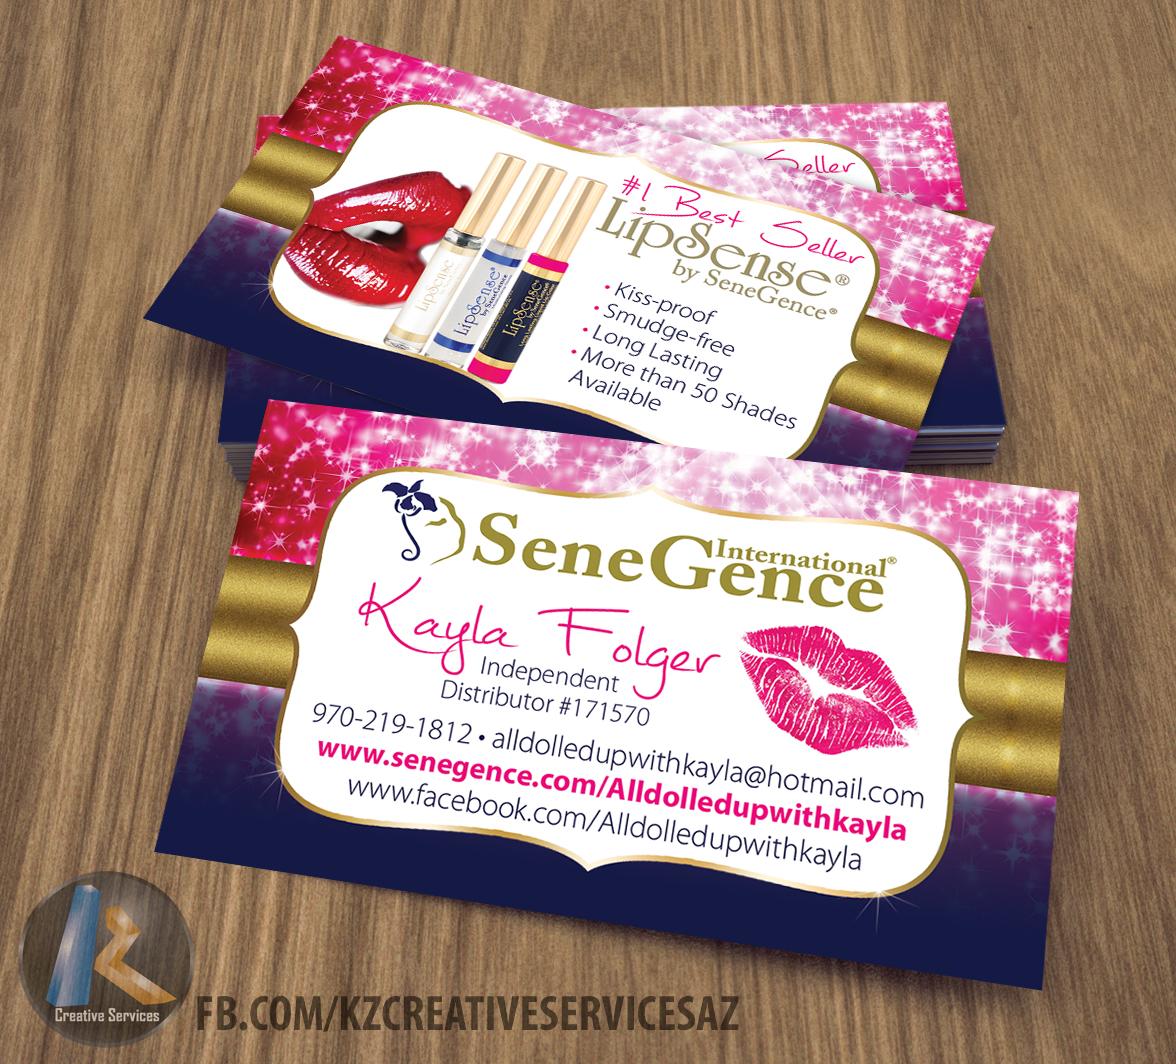 senegence business cards style 3 - Senegence Business Cards